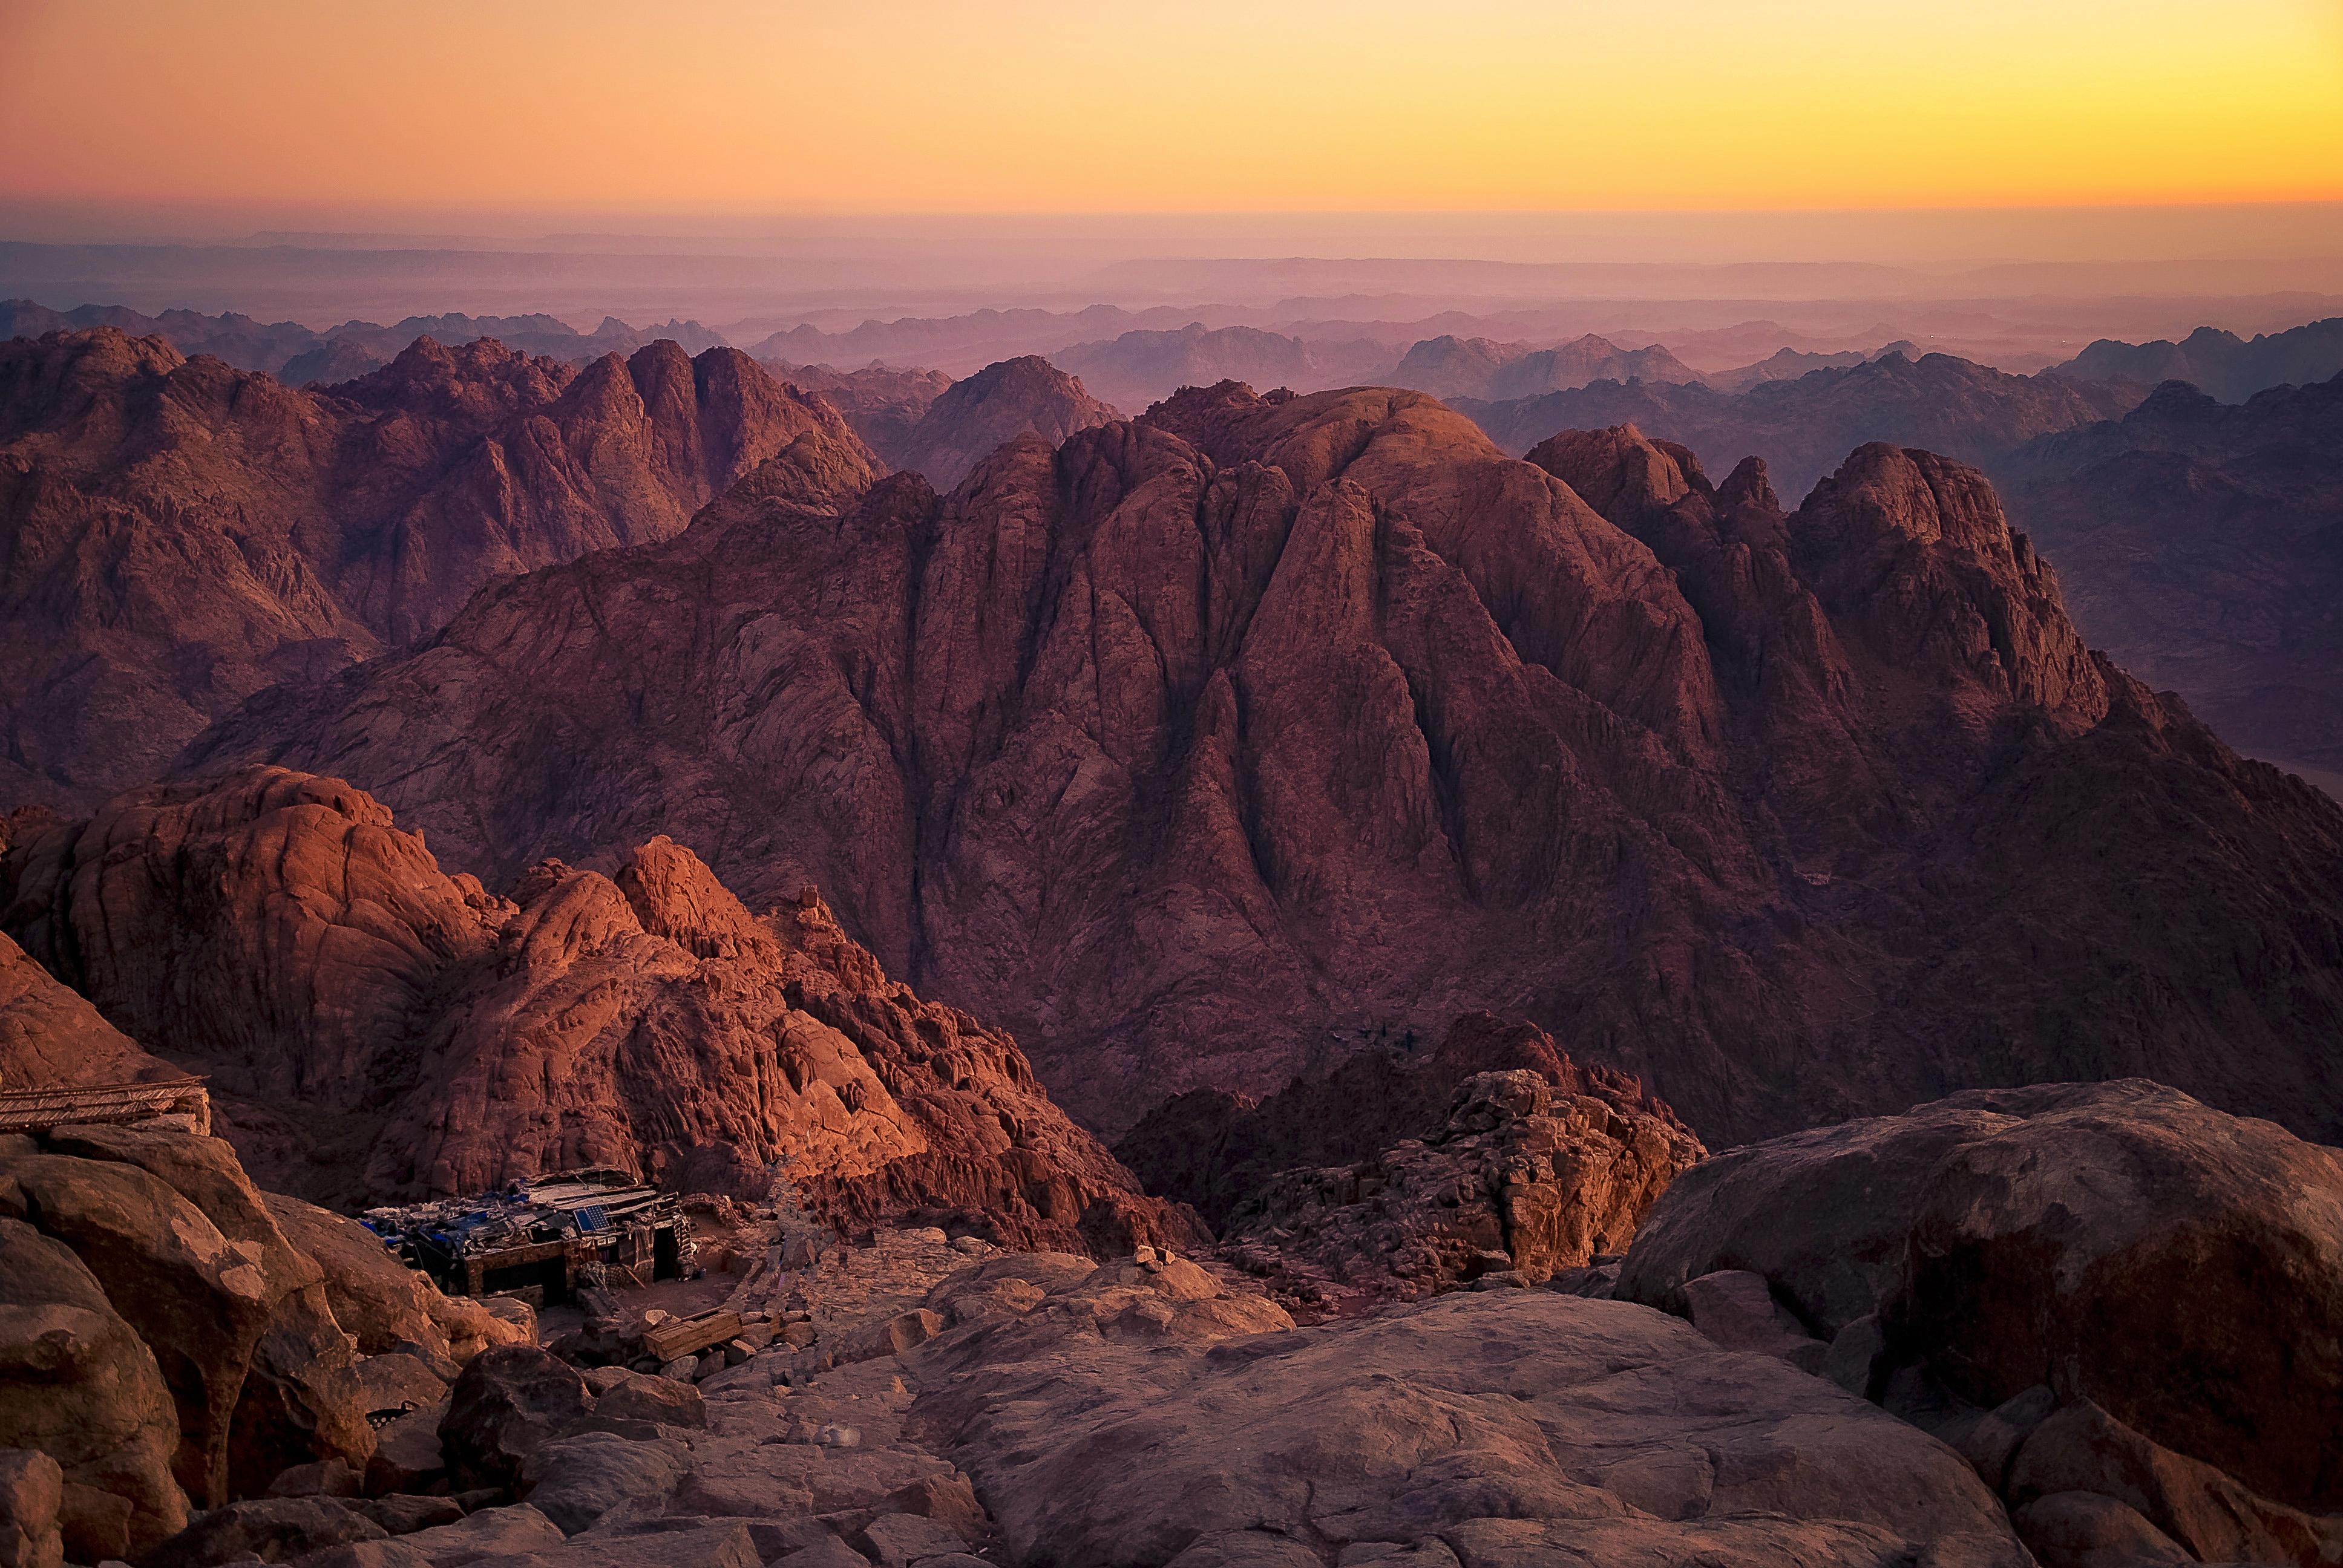 Mount Sinai - Wikipedia